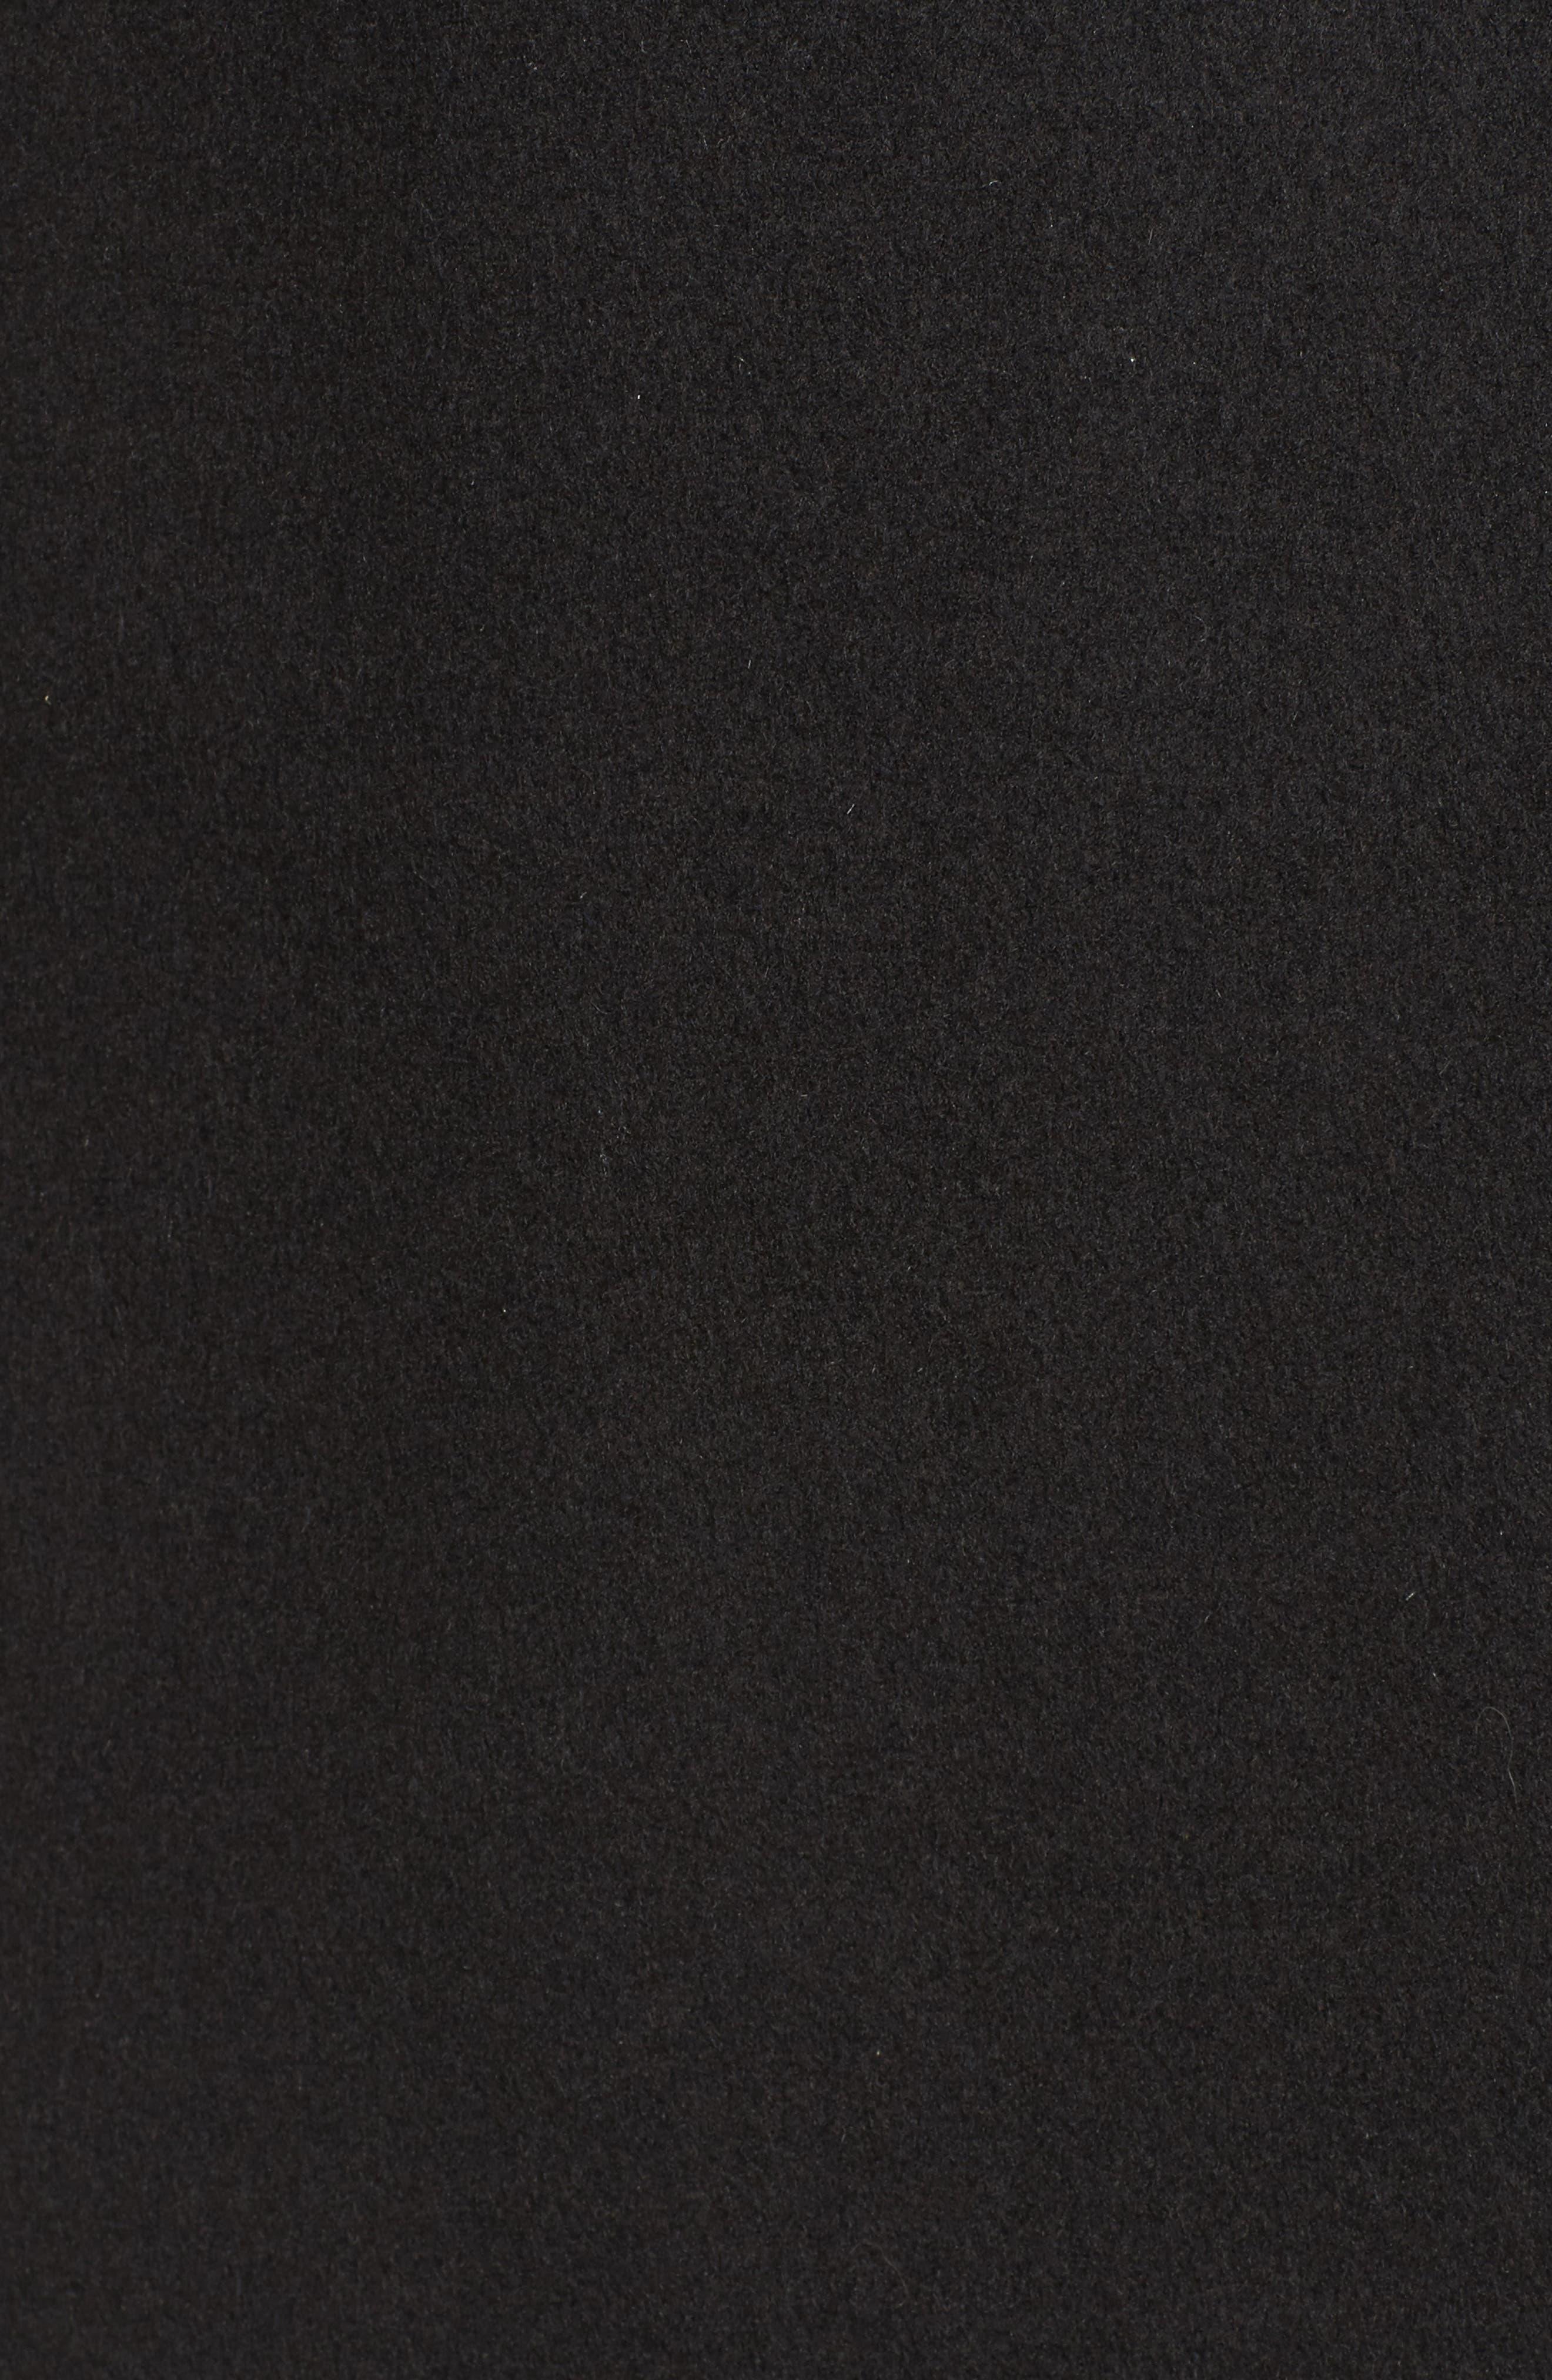 DKNY Lavish Wool Blend Coat,                             Alternate thumbnail 6, color,                             001